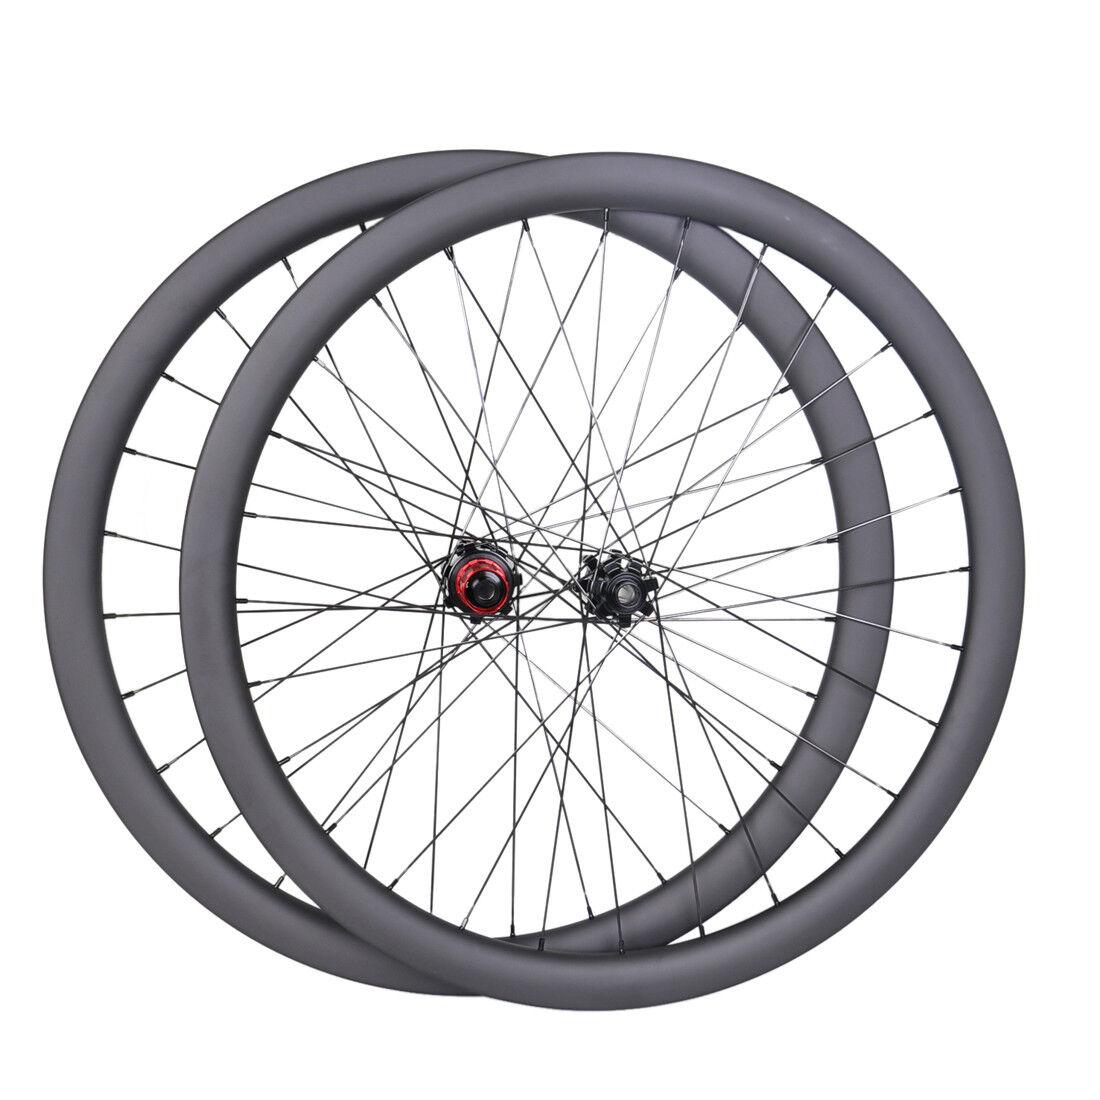 Tubular Sapim 40mm Carbon Wheelset 27mm Road bike 700C Disc Hub Chosen UD Matt